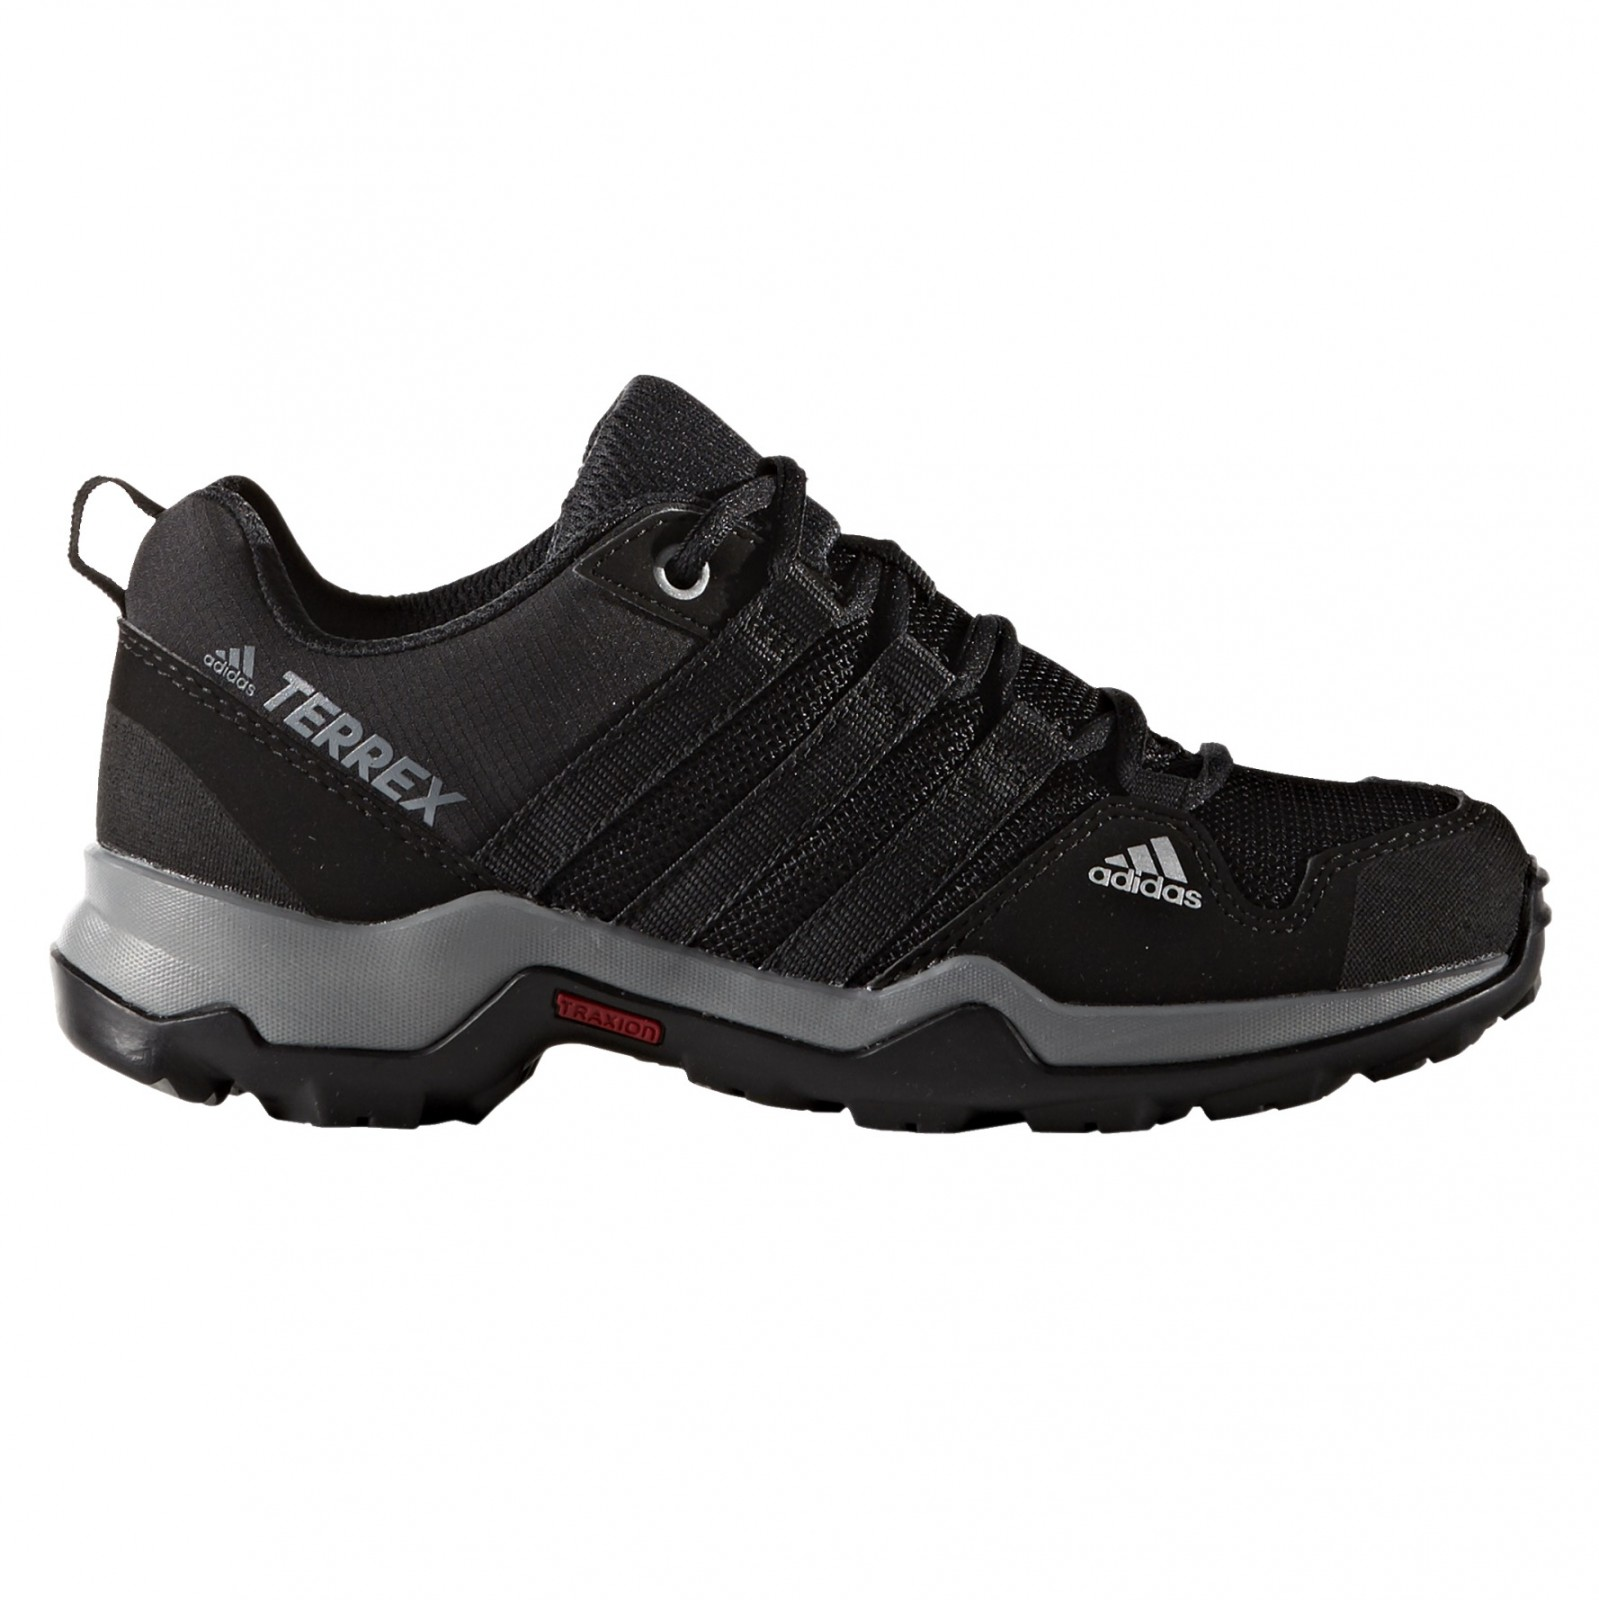 953d5331cc Dětská treková obuv adidas TERREX AX2R K